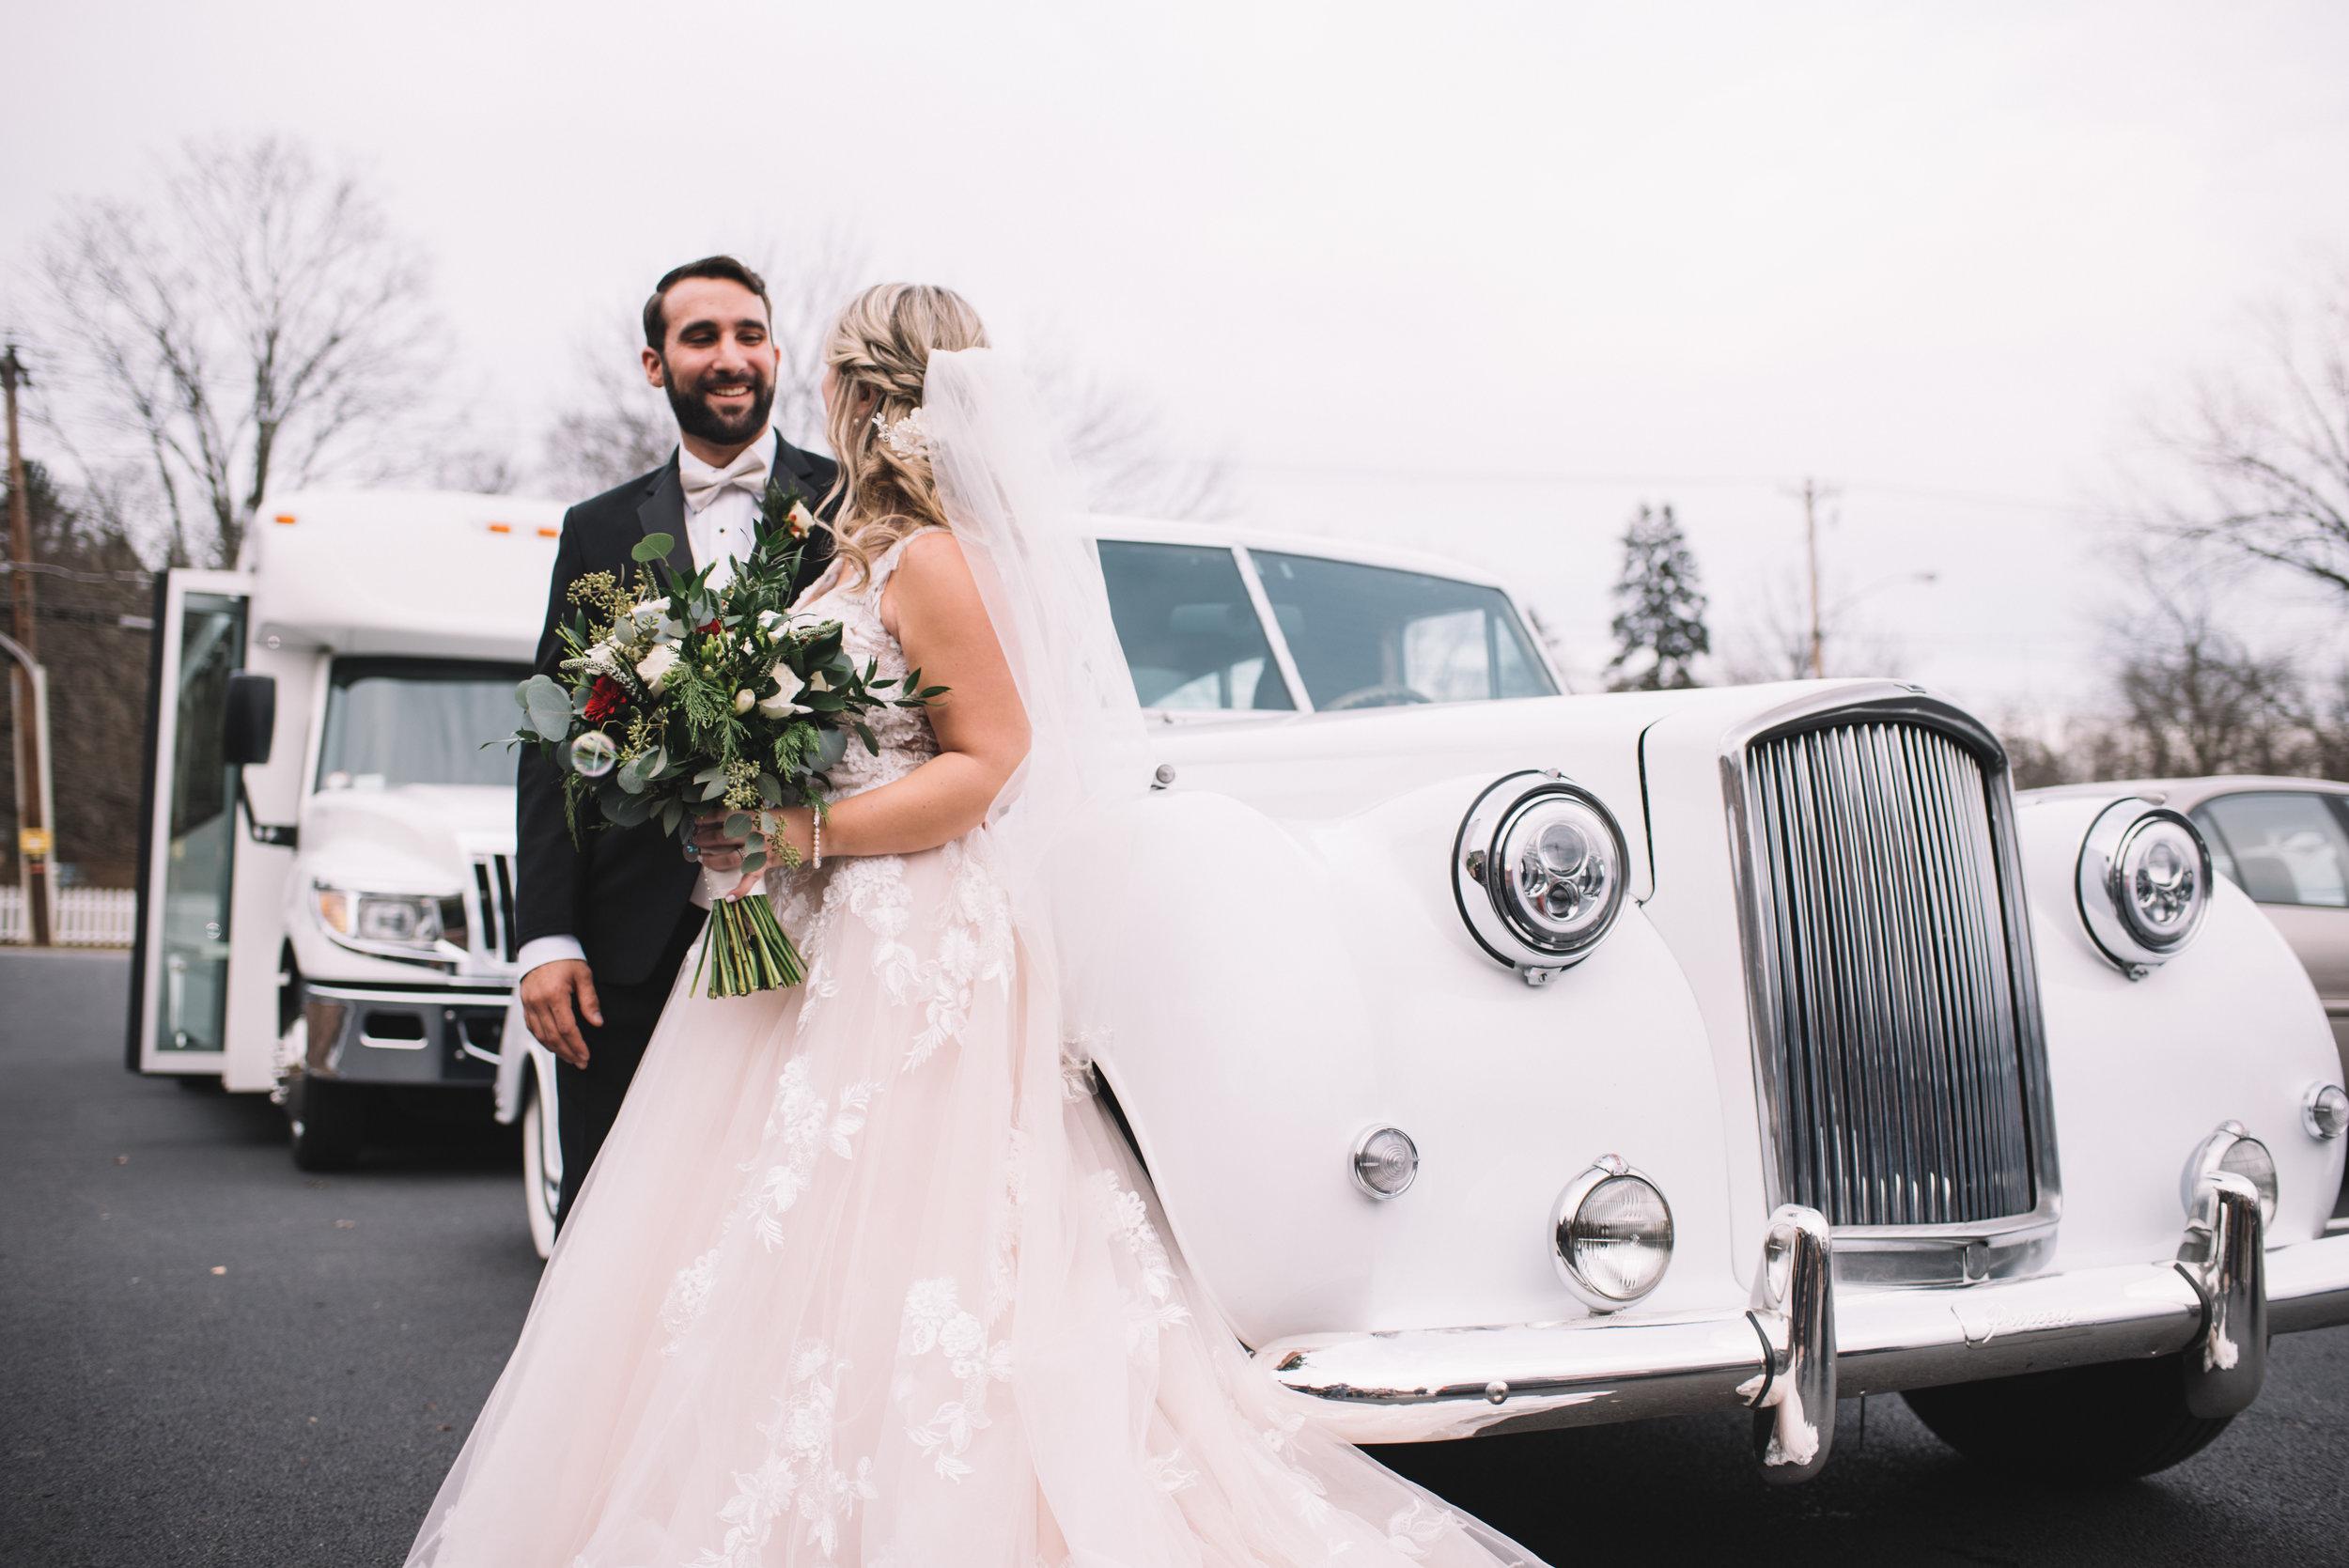 WeddingPhotos | NJPhotographer | Highlights-11-25.jpg